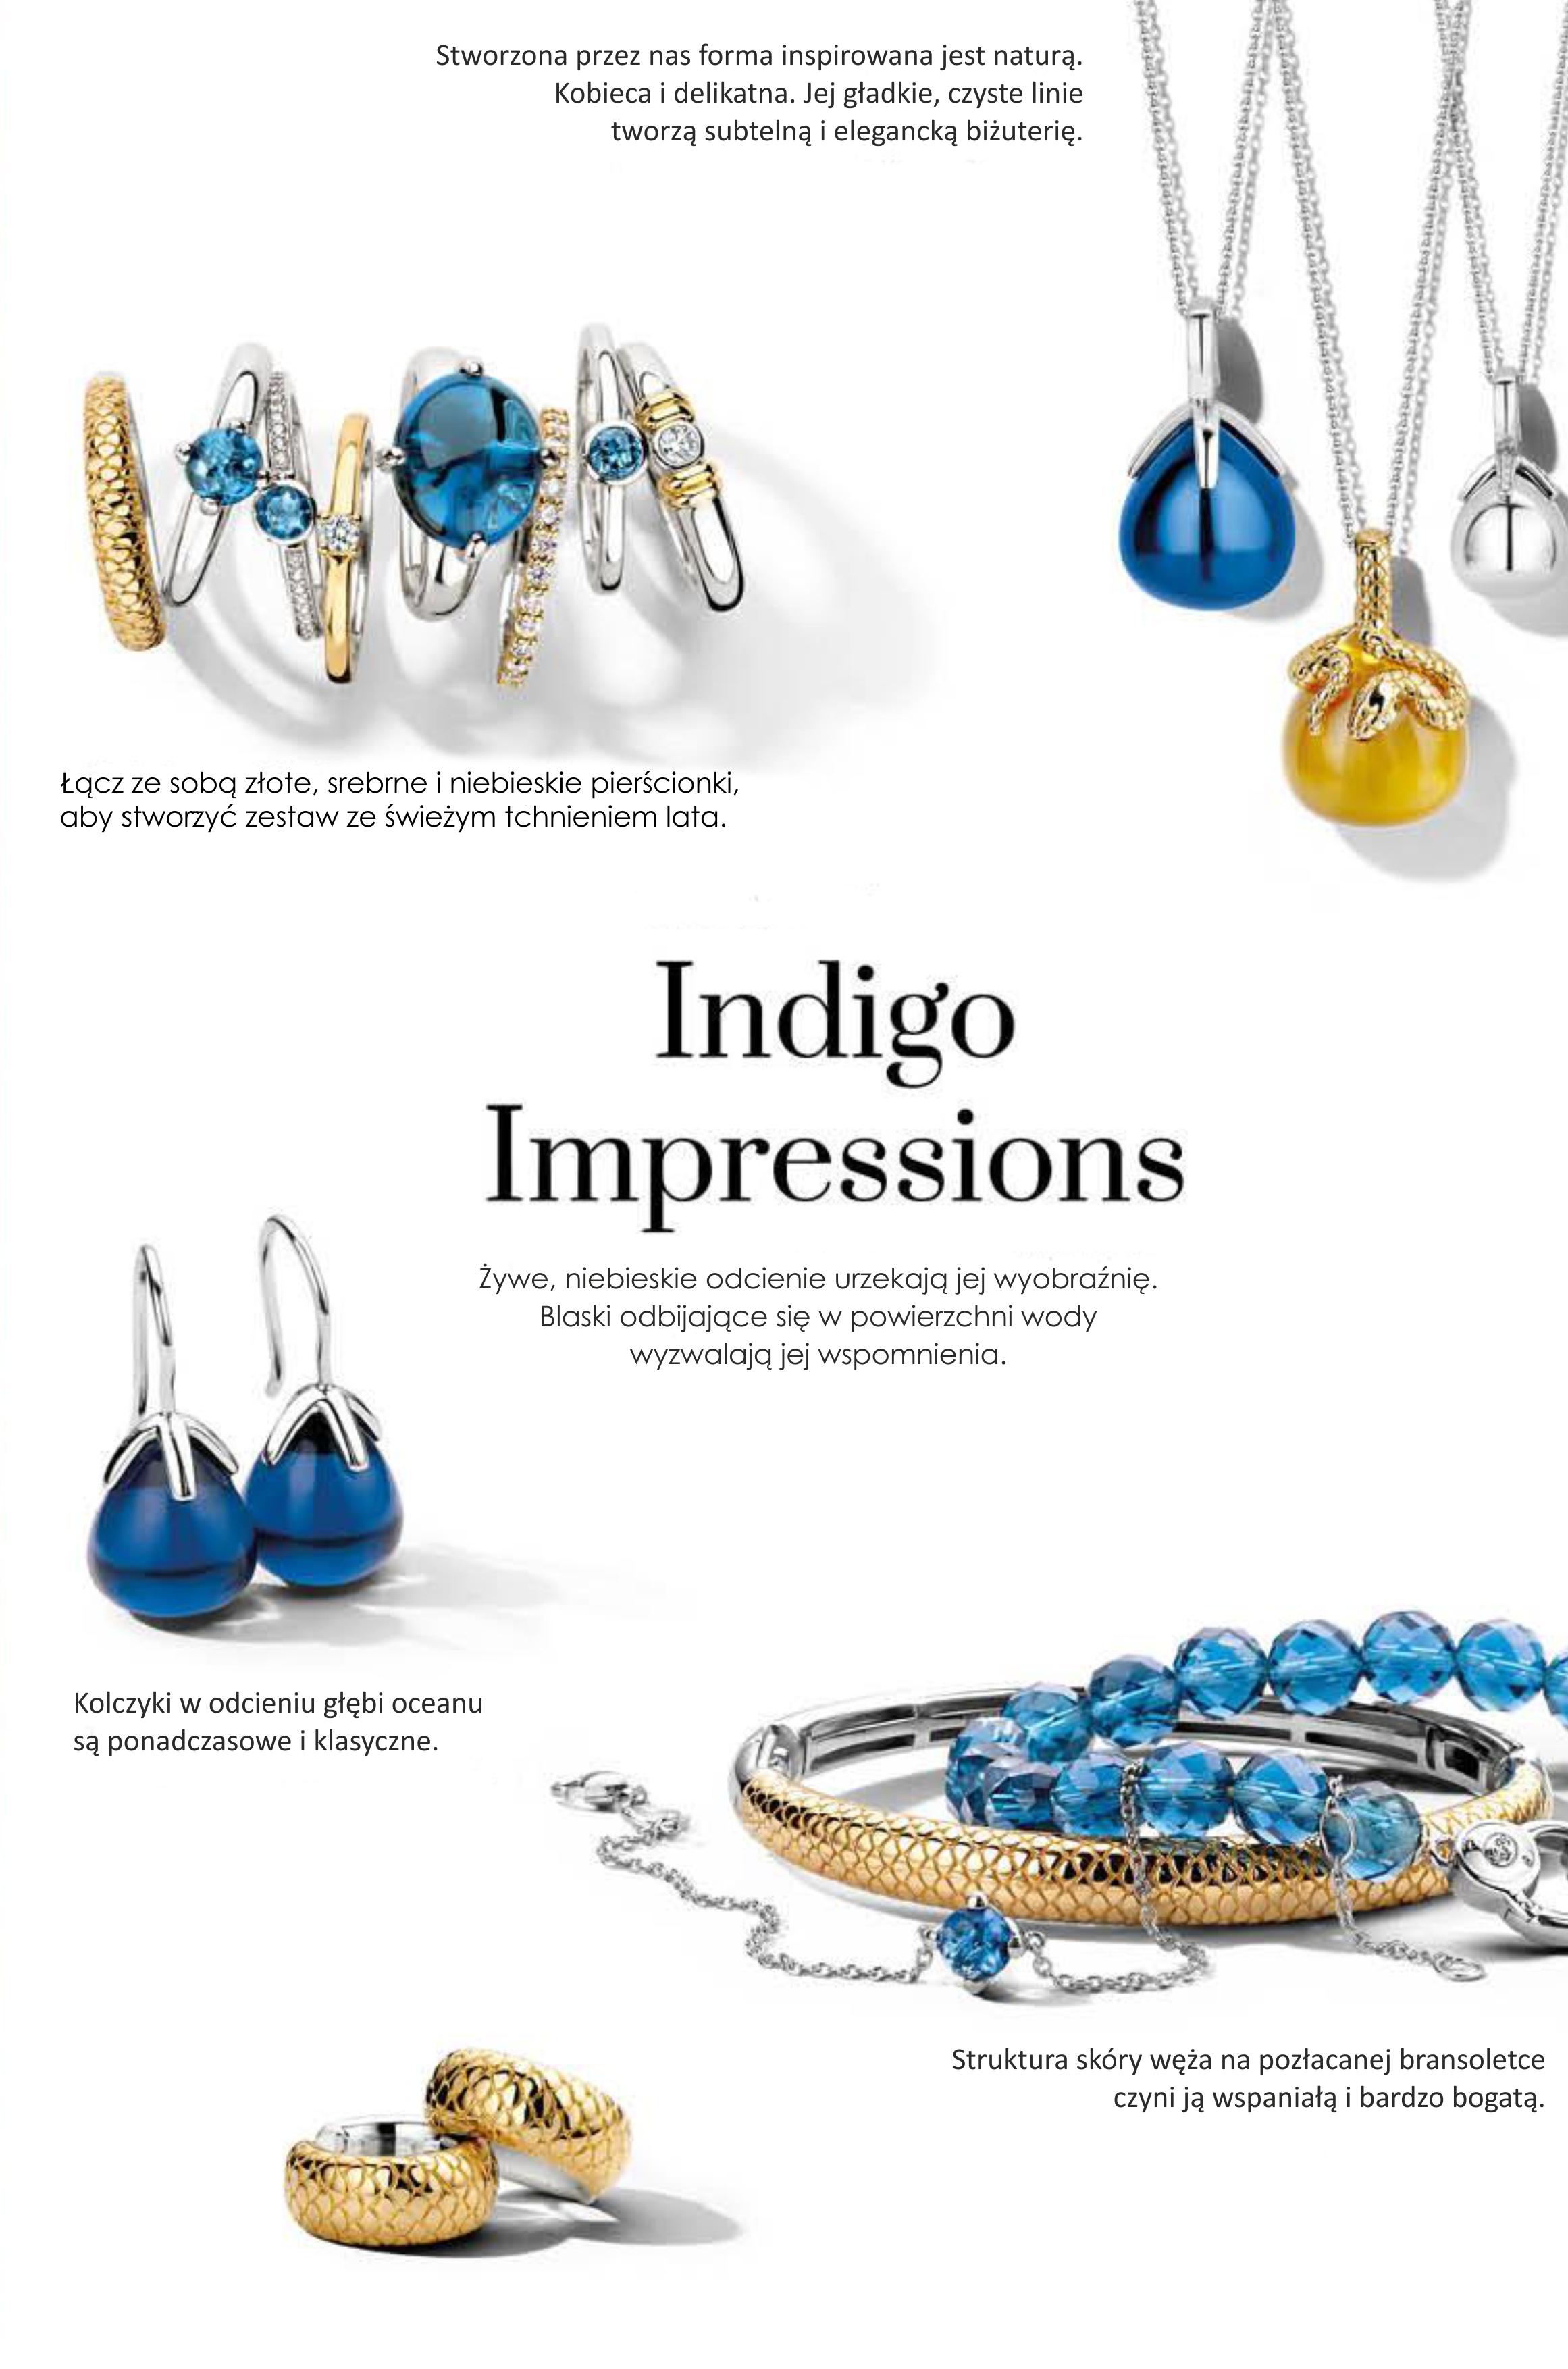 IndigoImpressions